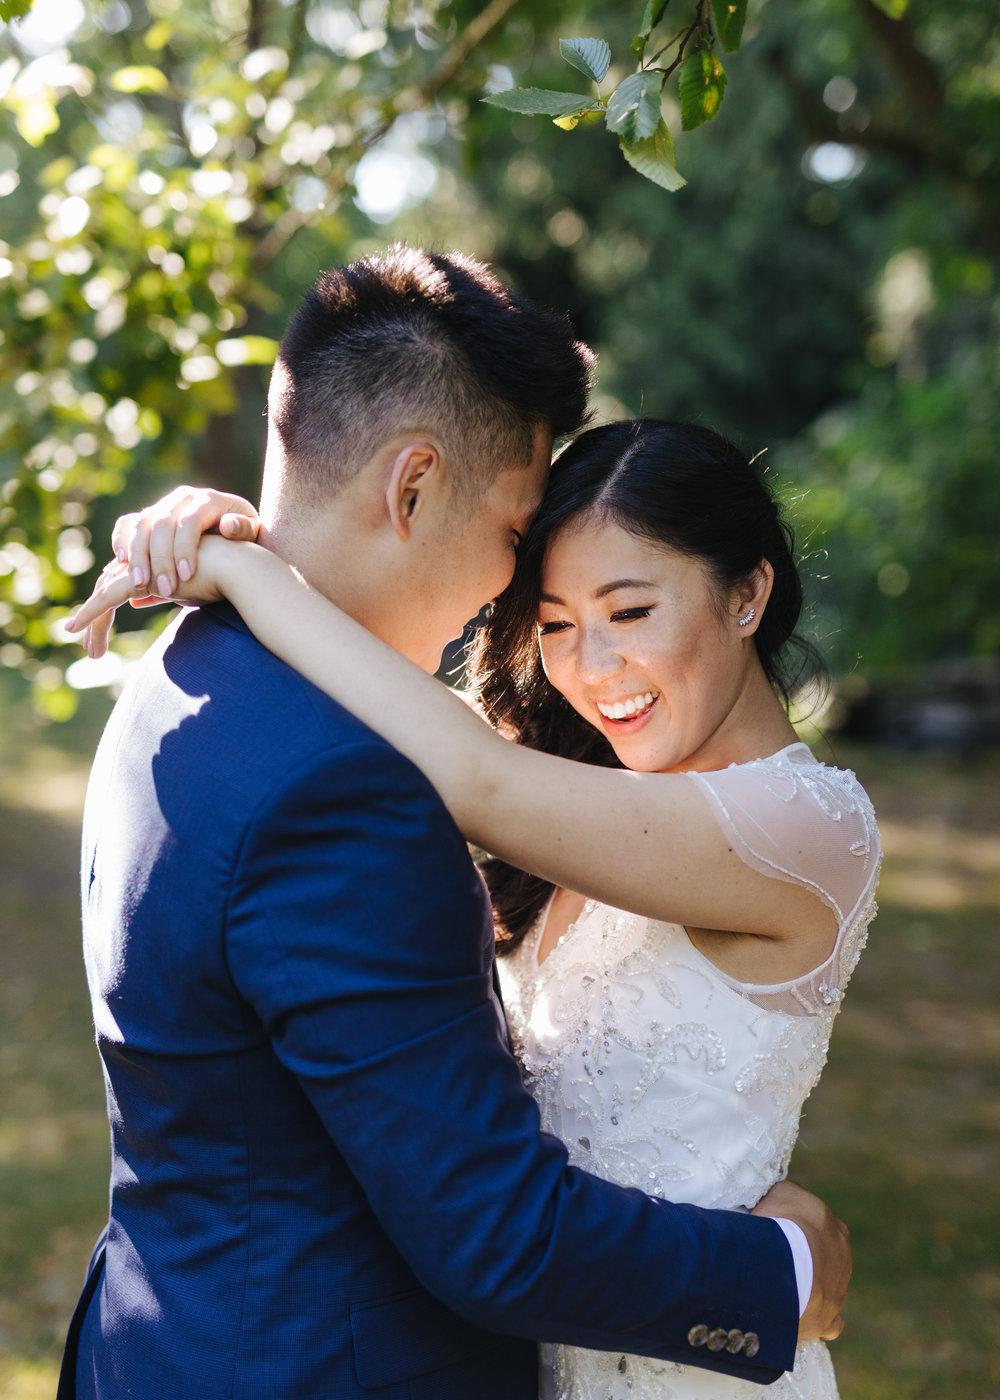 herastudios_wedding_tracy_kyley_hera_selects-64.jpg